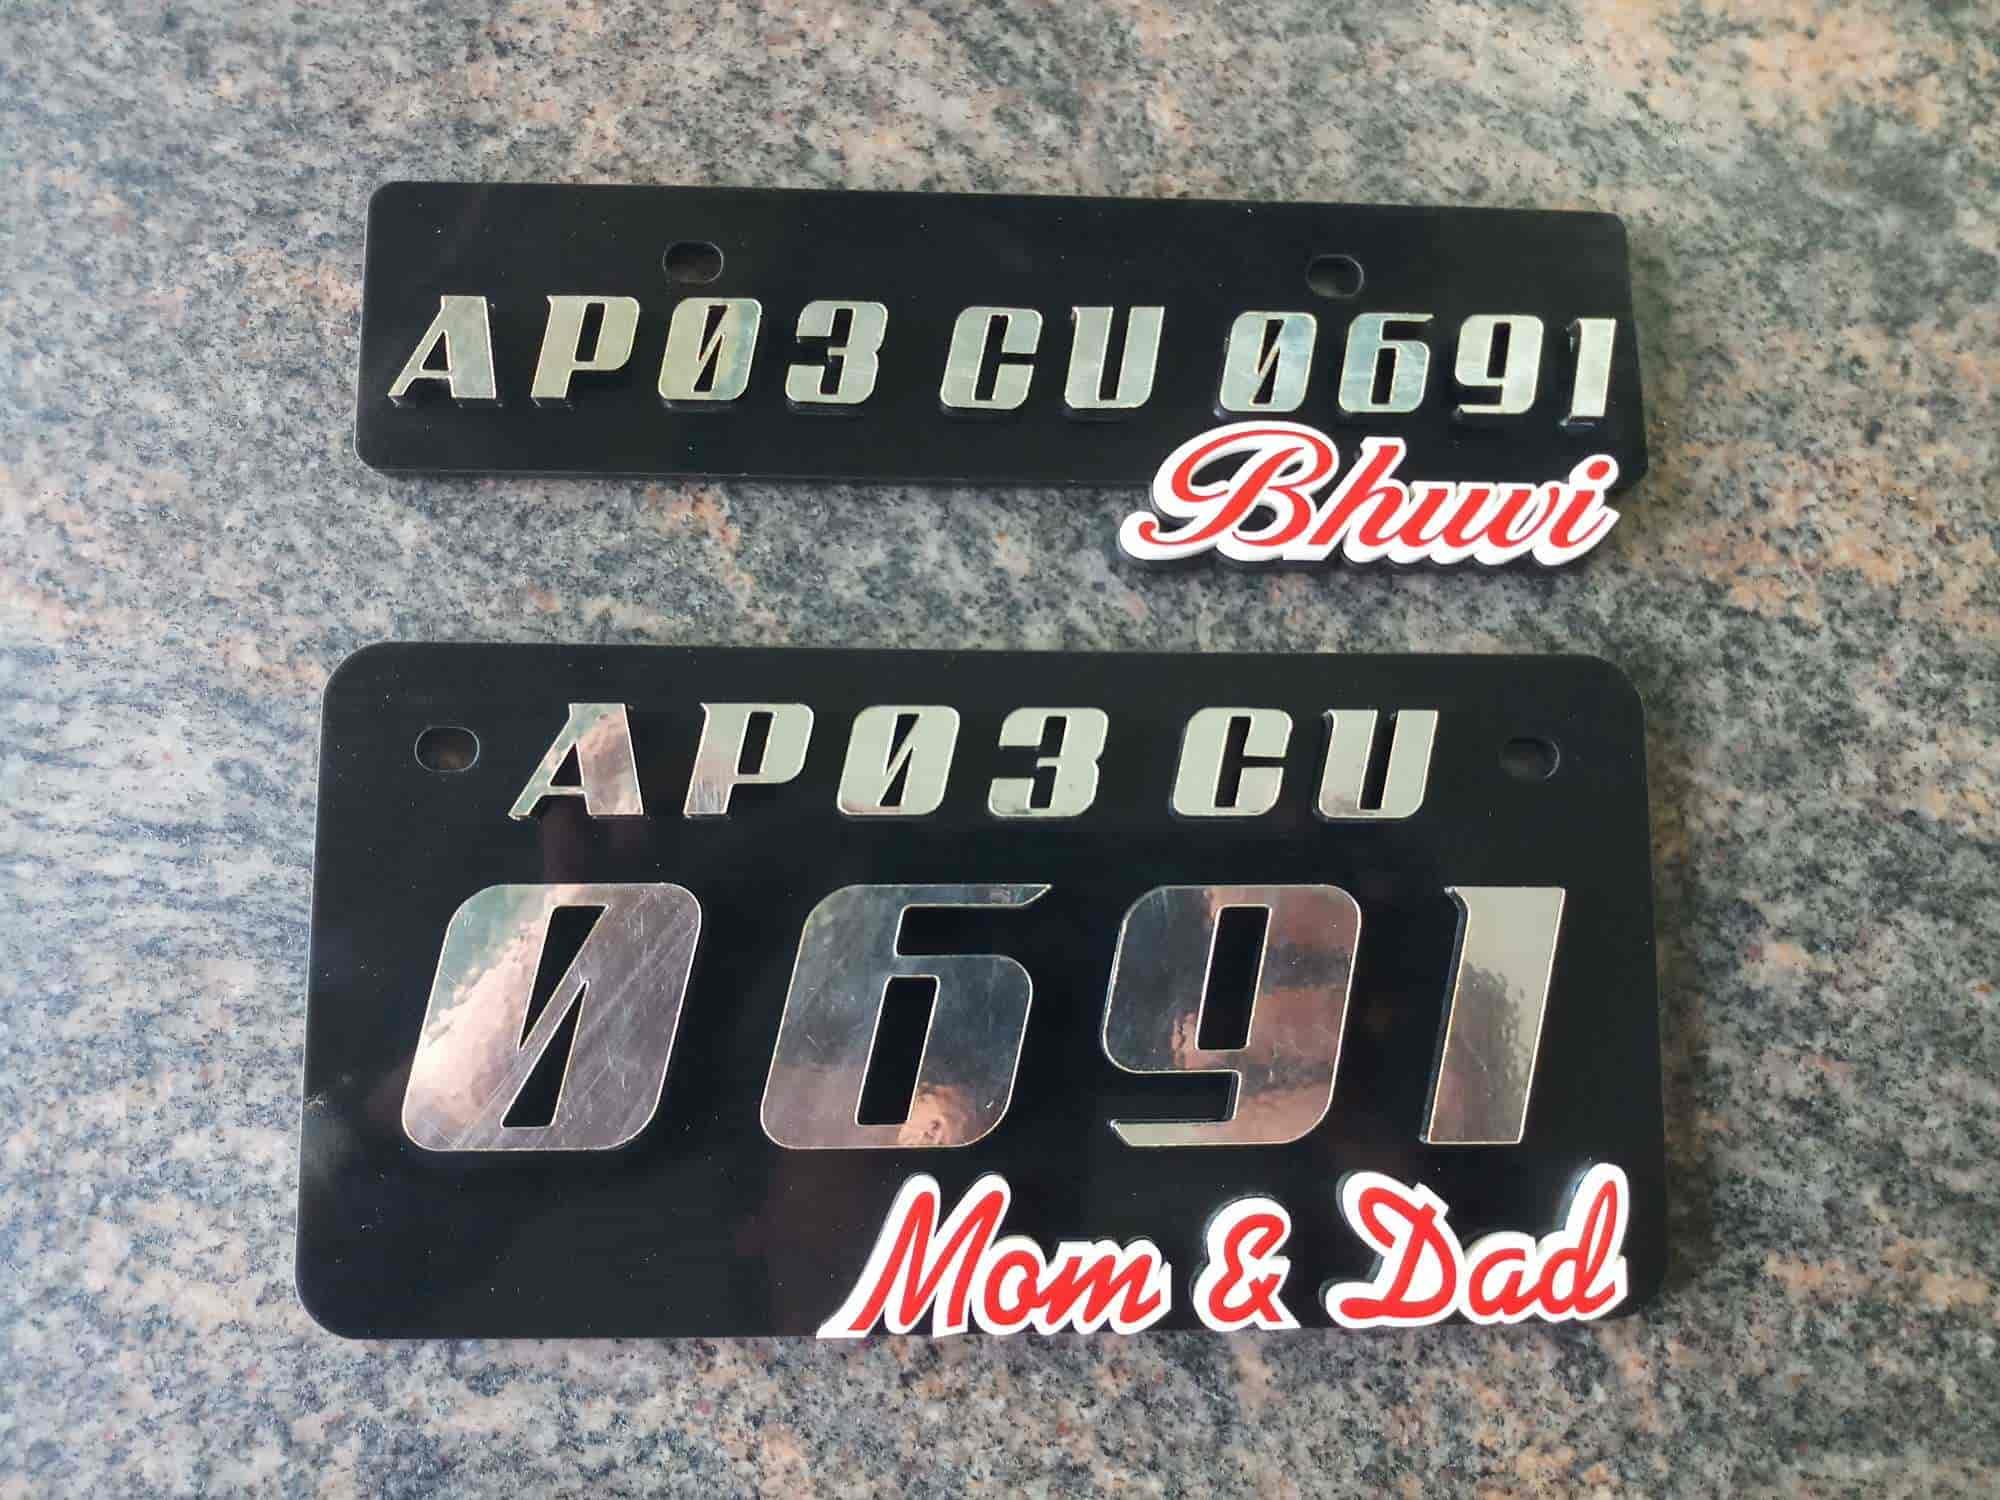 Sri venkateswara stickering tml by pass road car number plate dealers in tirupati justdial